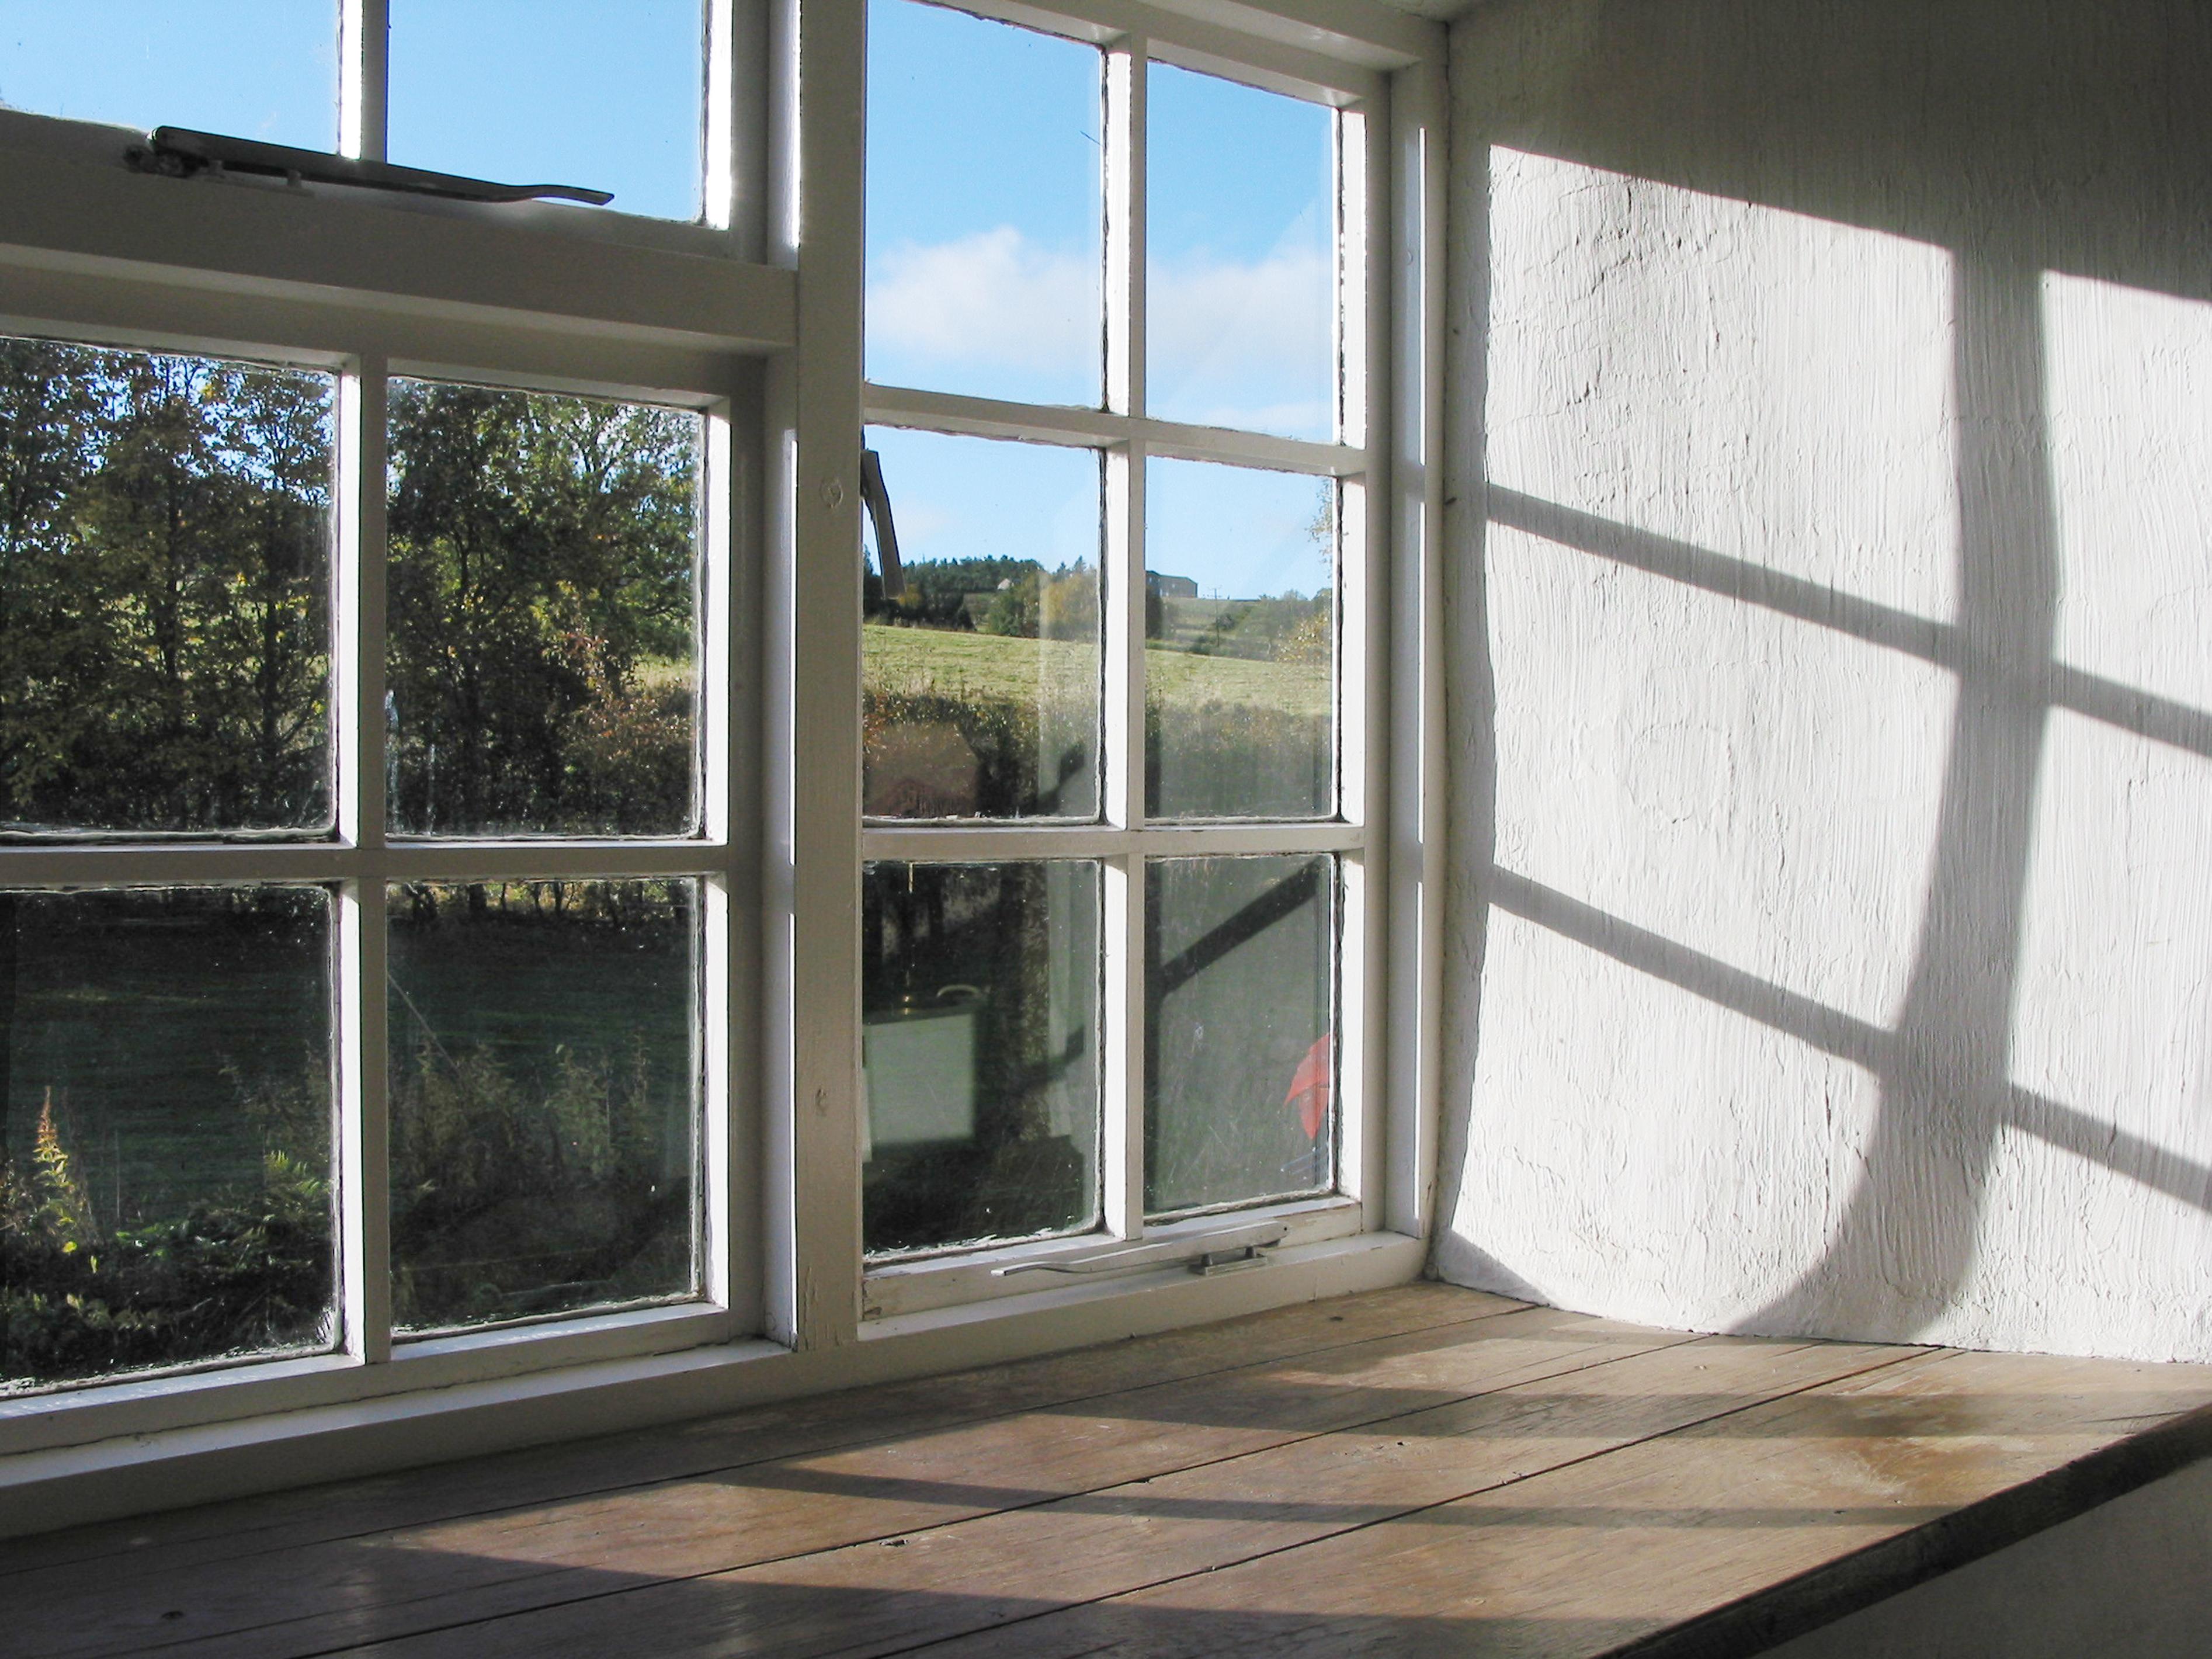 Energy Efficient Windows : Best energy efficient windows to save electricity